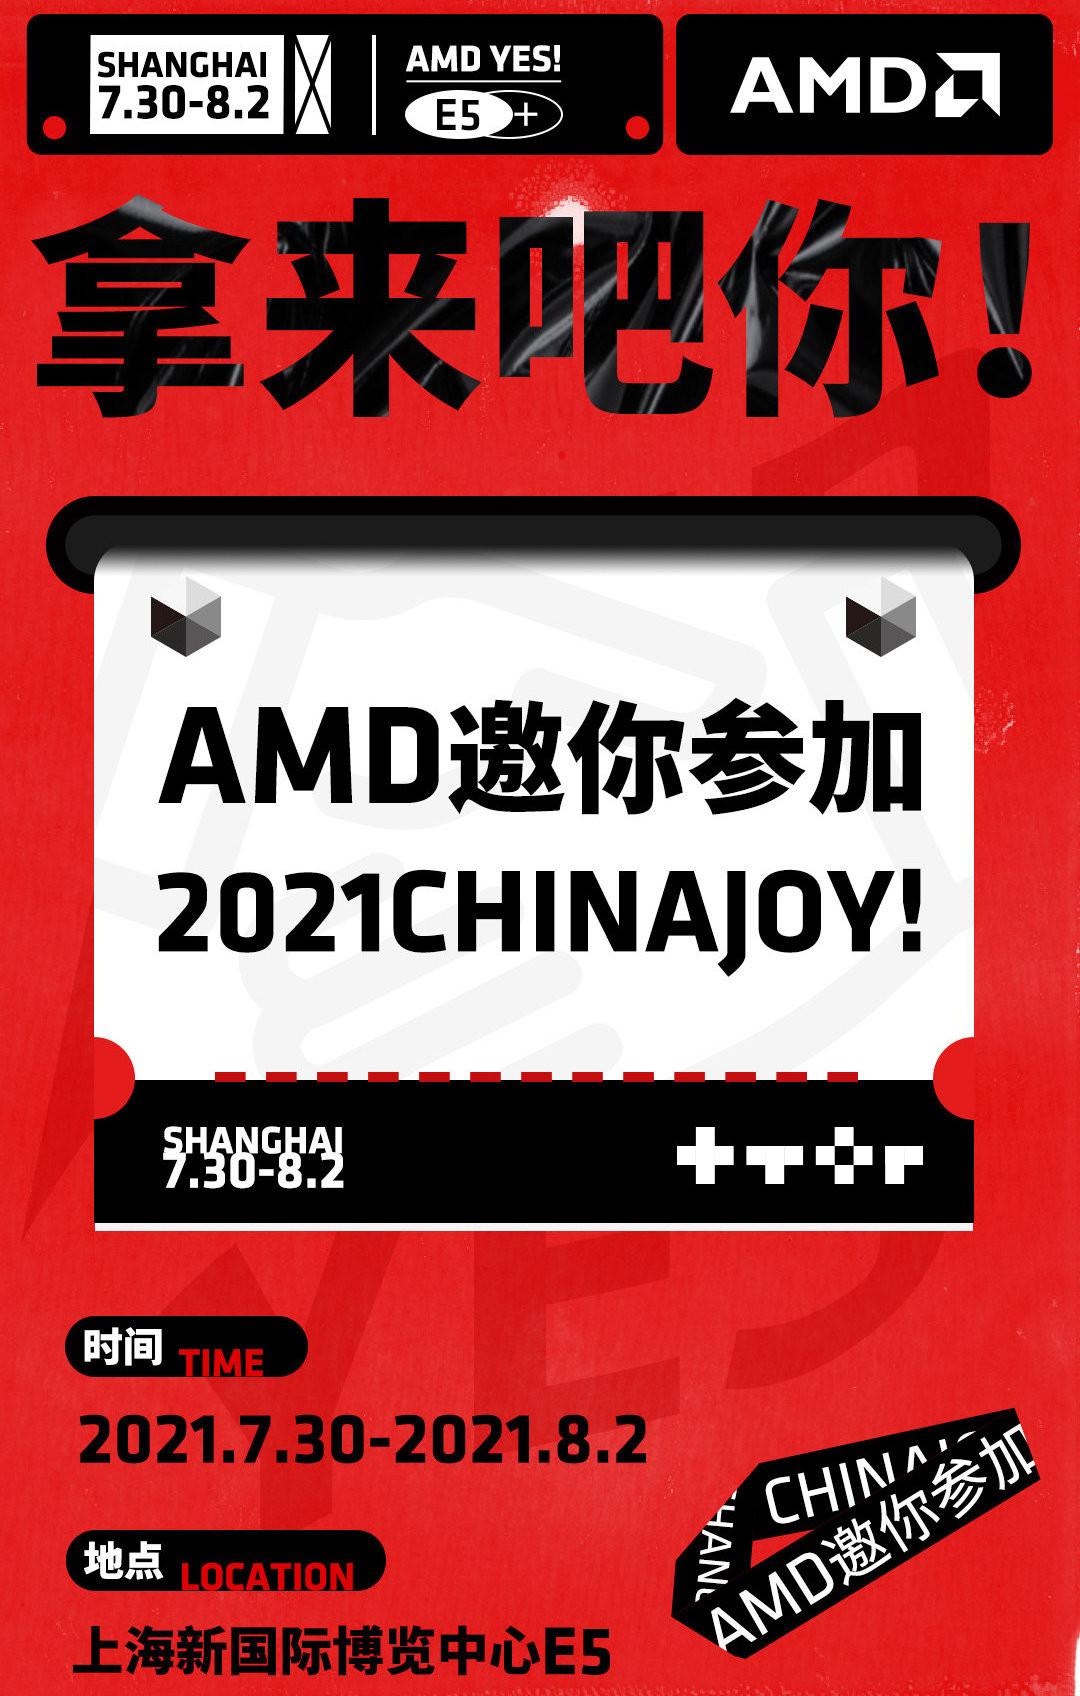 AMD ChinaJoy 2021 teaser